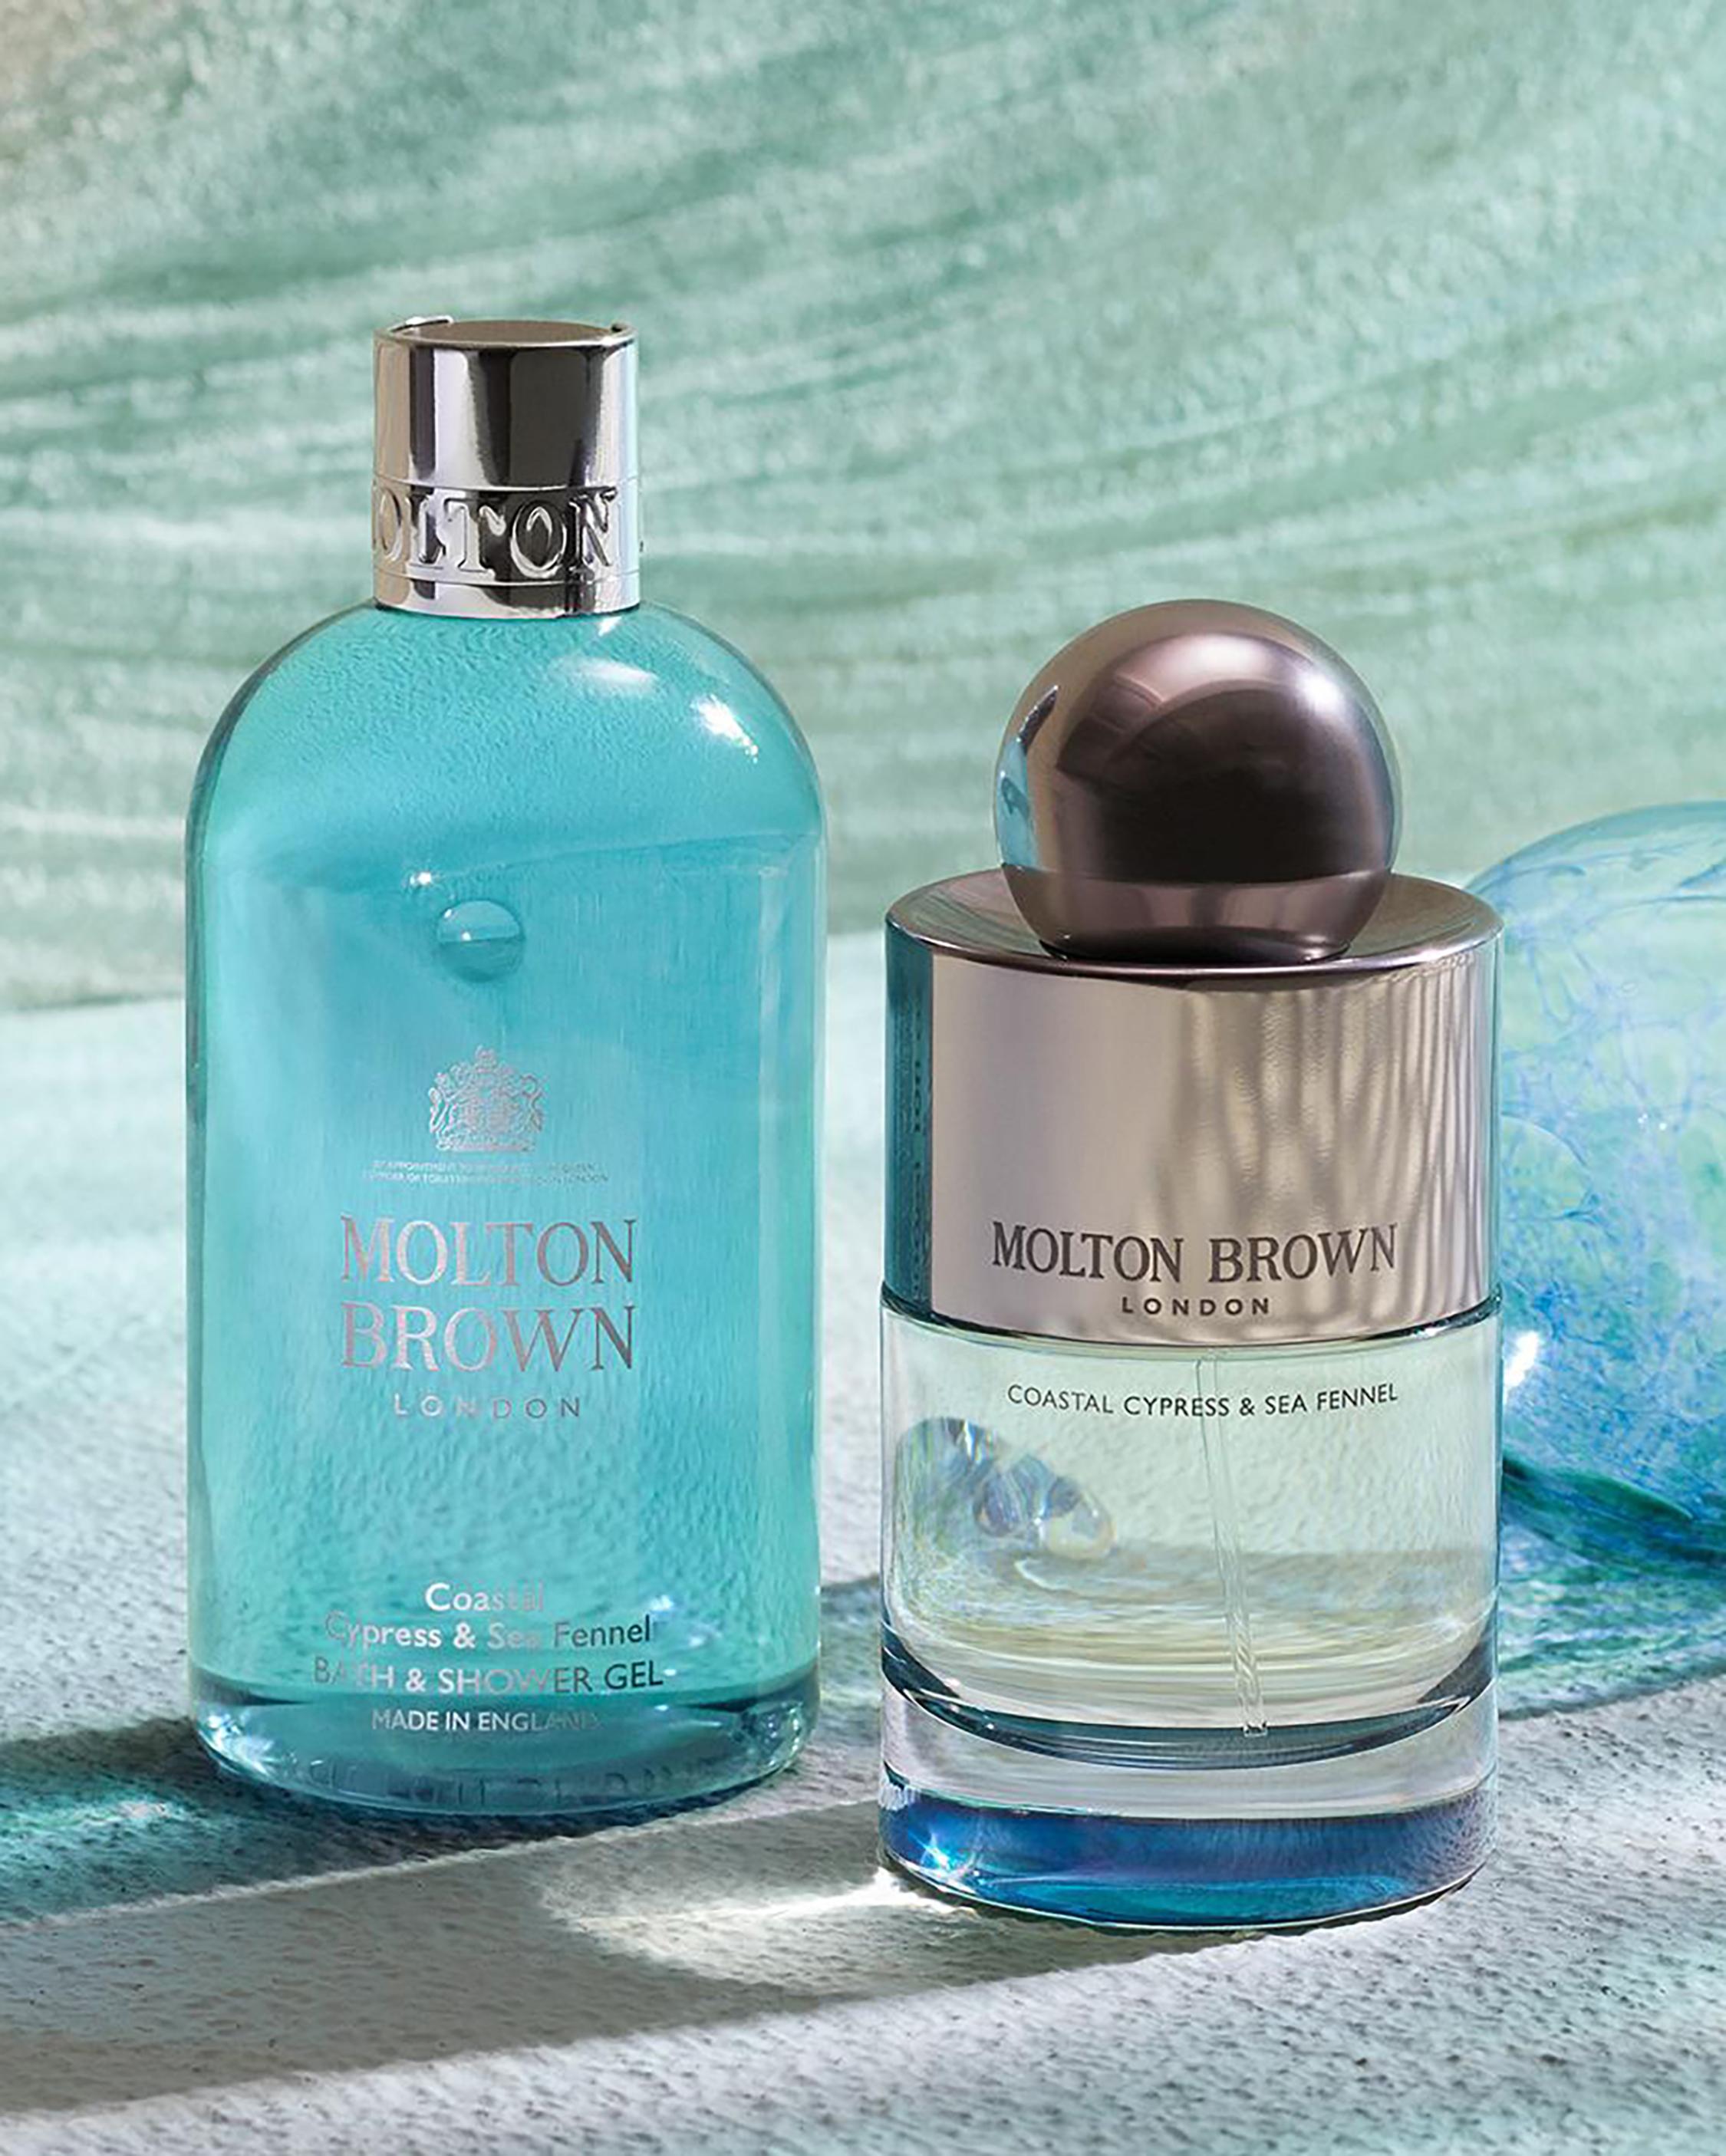 Molton Brown Coastal Cypress & Sea Fennel Fragrance Collection 2